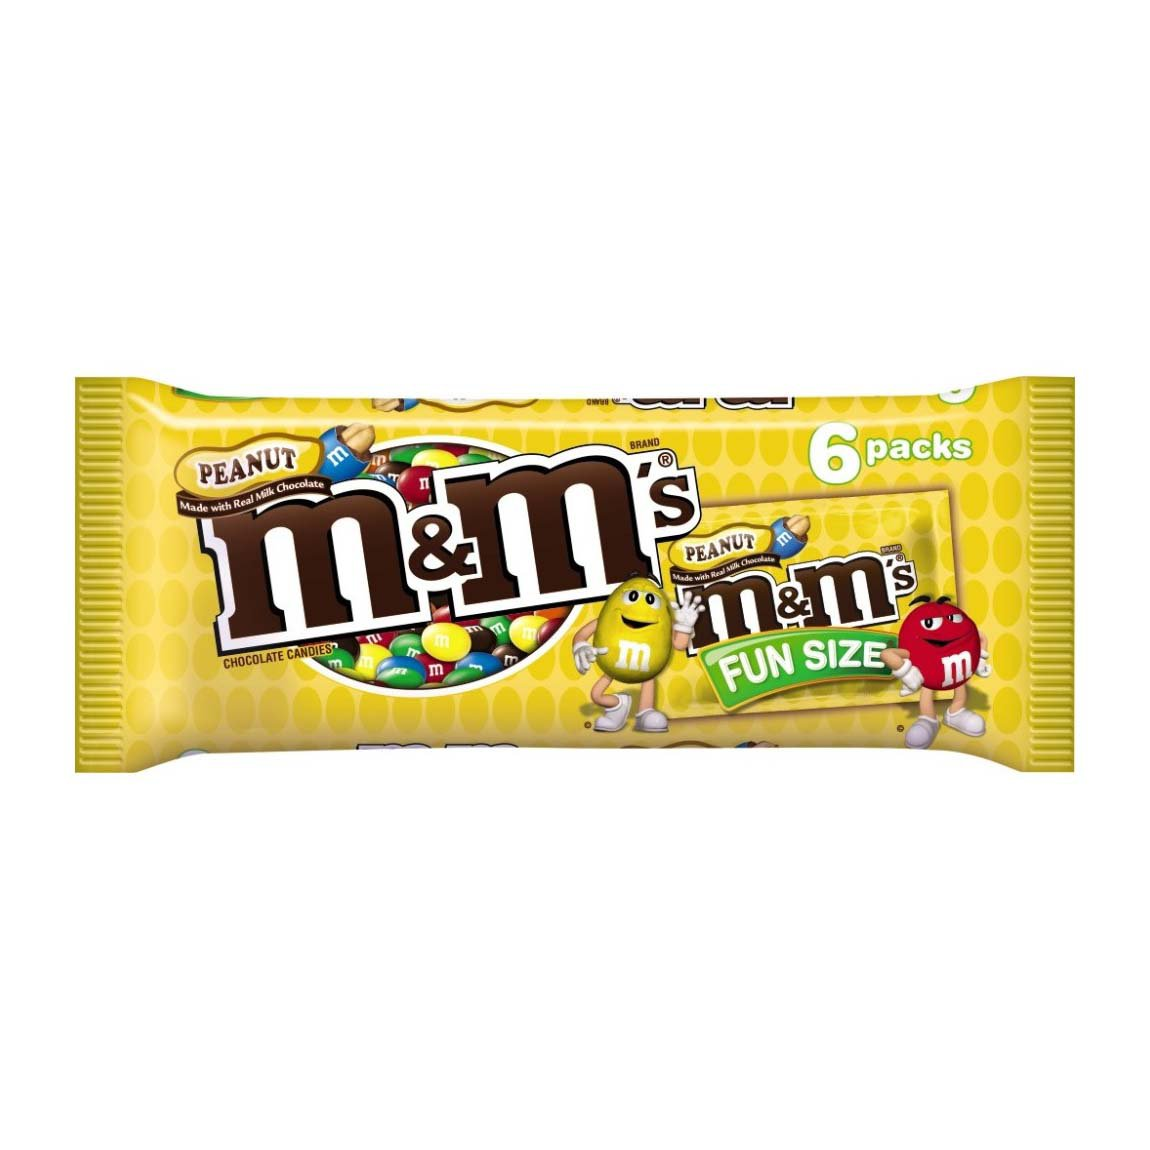 Peanut Chocolate Candy 6 Fun Size Packs